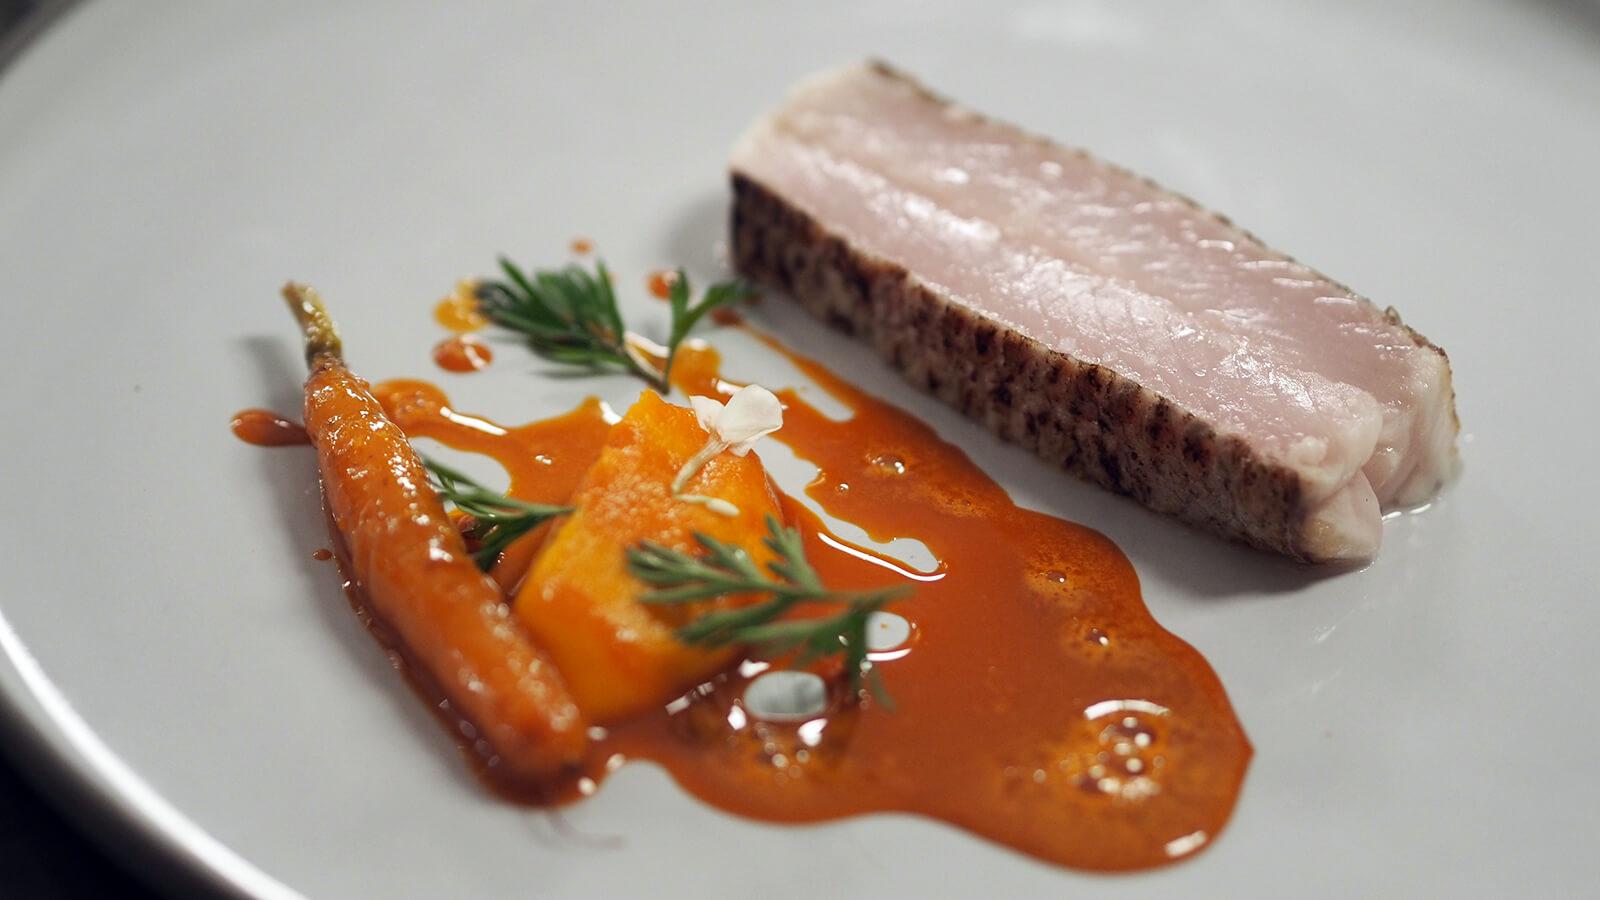 Restaurant Loiseau Rive Gauche 75007